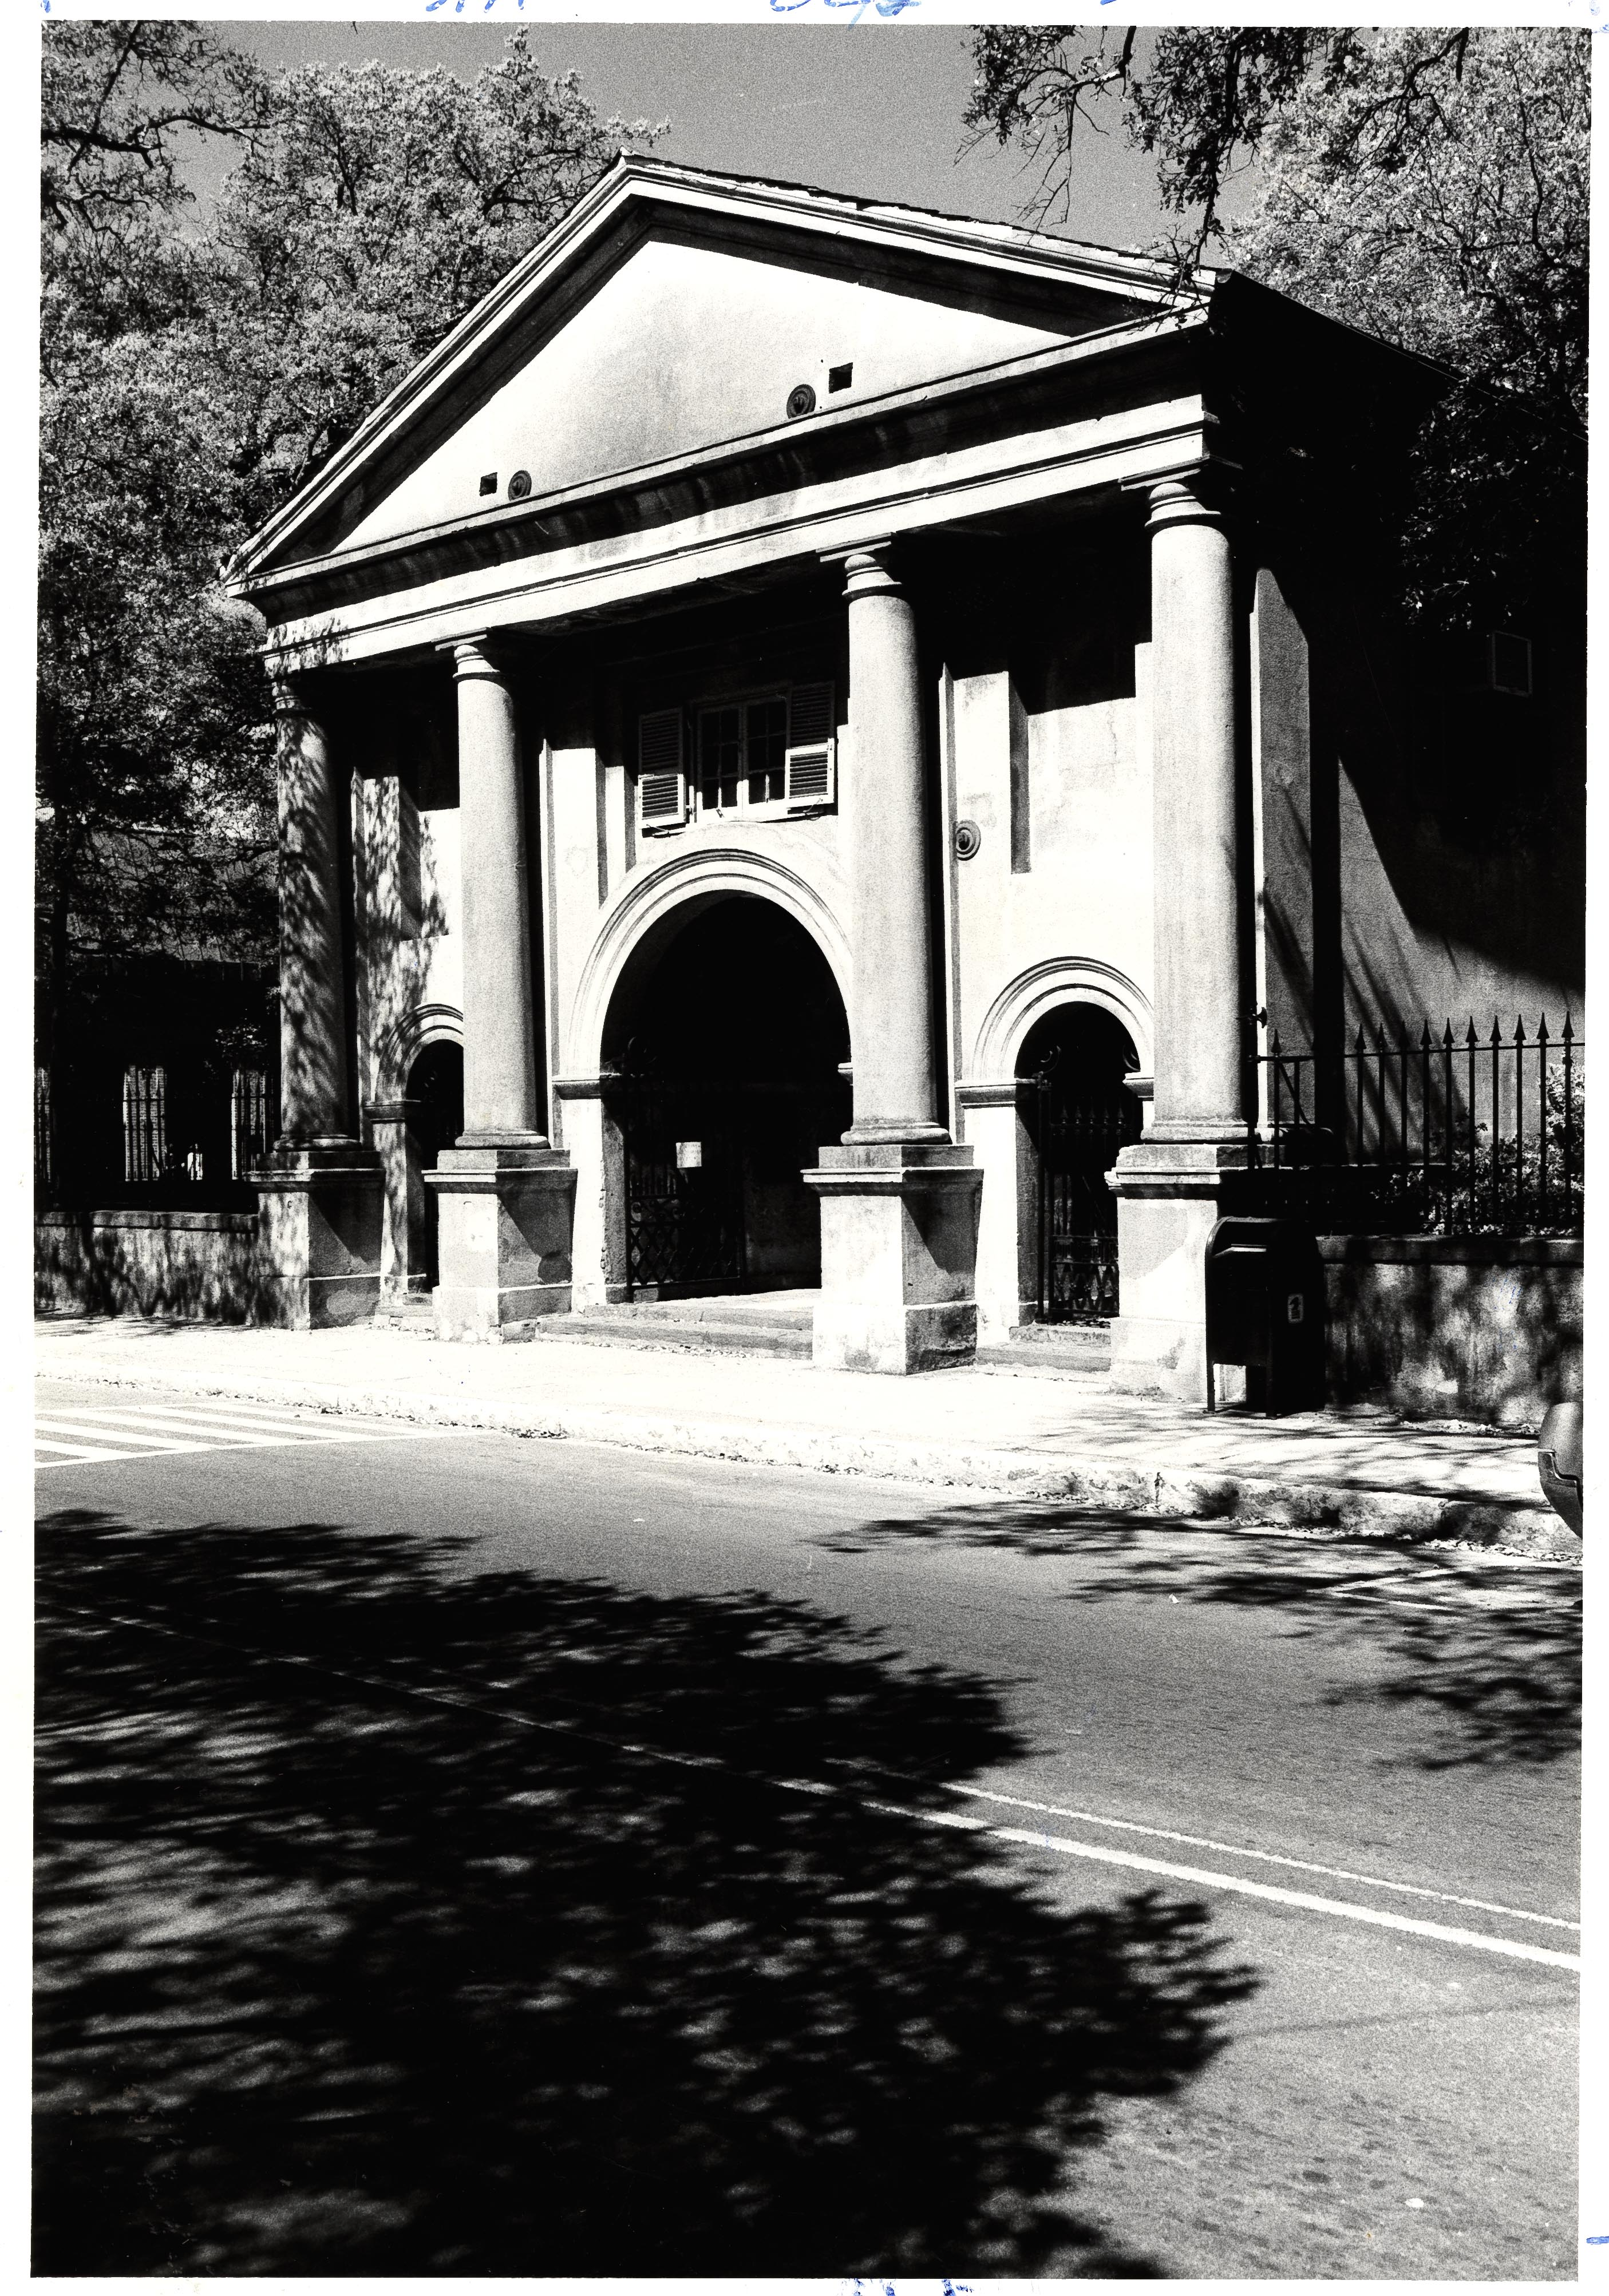 Porters Lodge